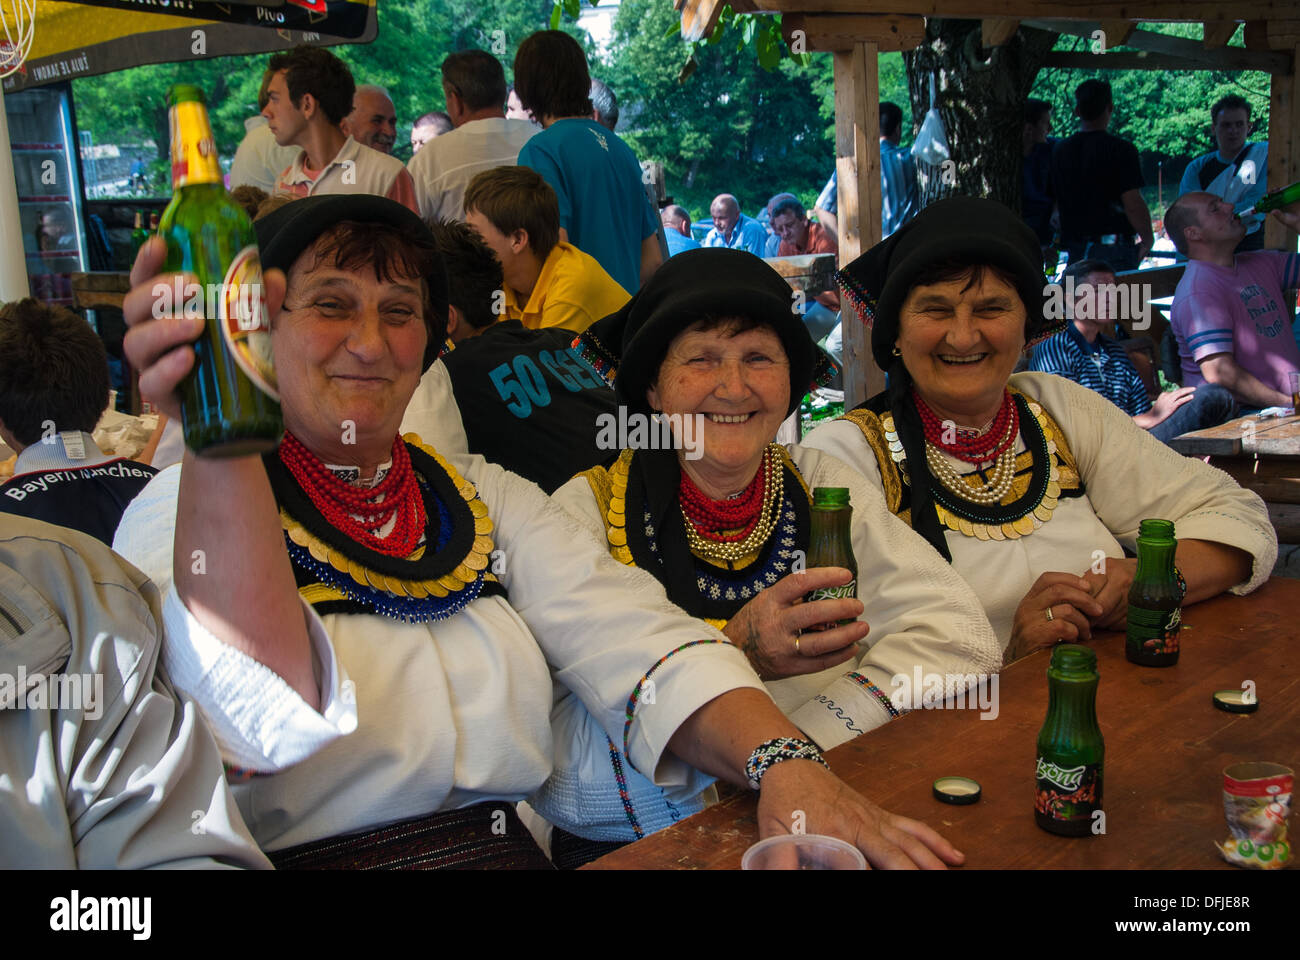 Three unidentified women with traditional clothes in Kraljeva Sutjeska, Bosnia and Herzegovina. - Stock Image